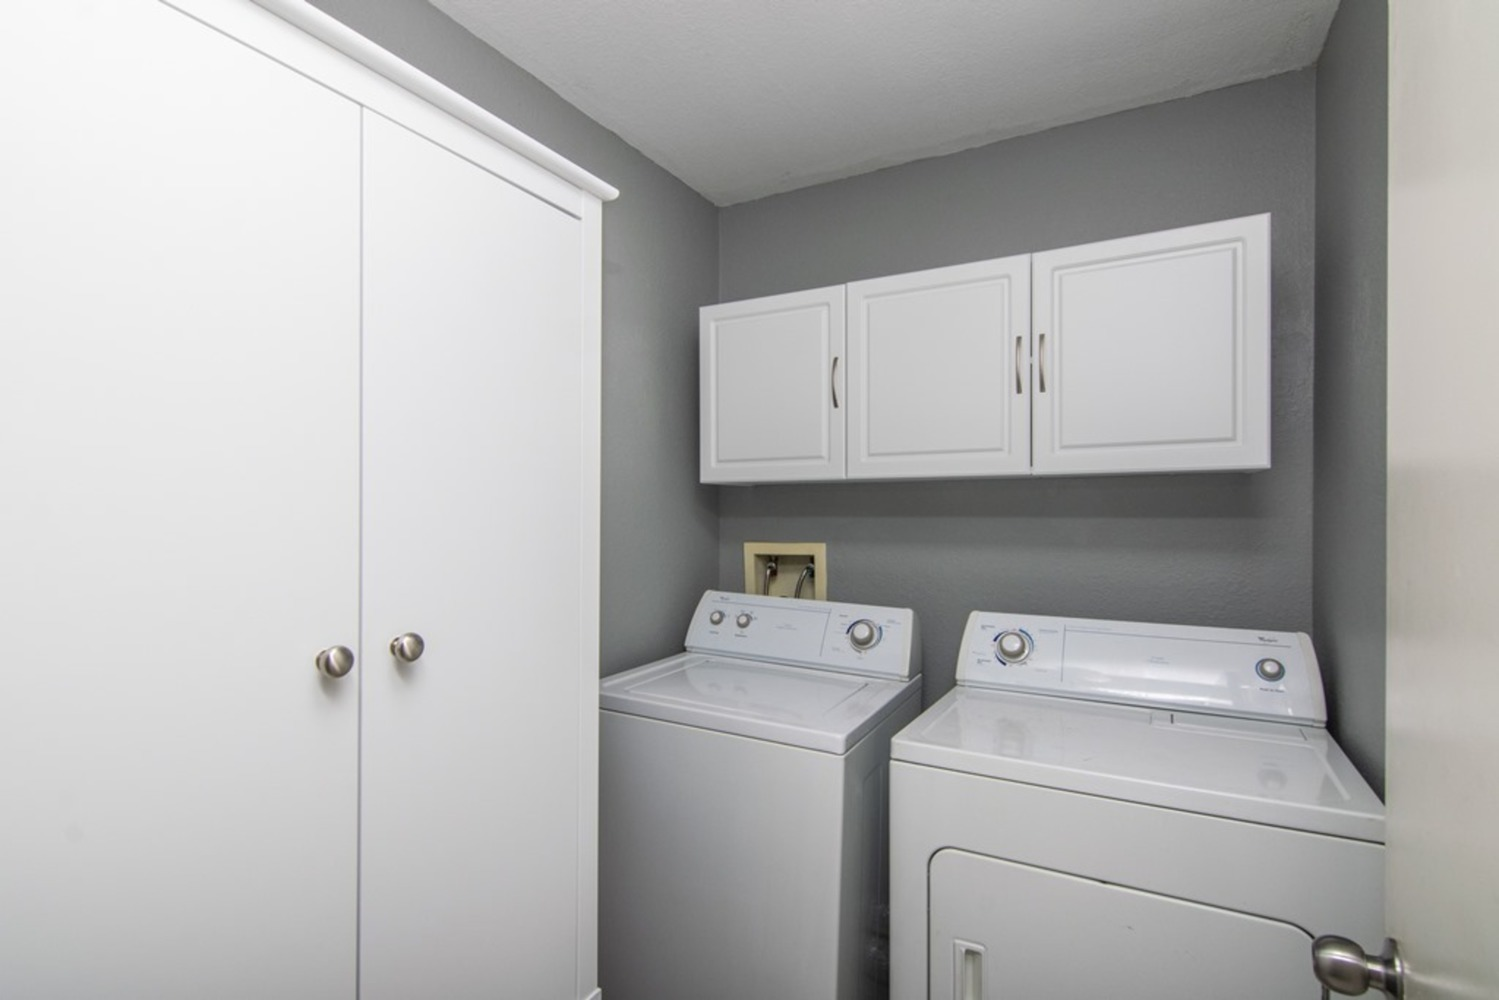 6 laundry room